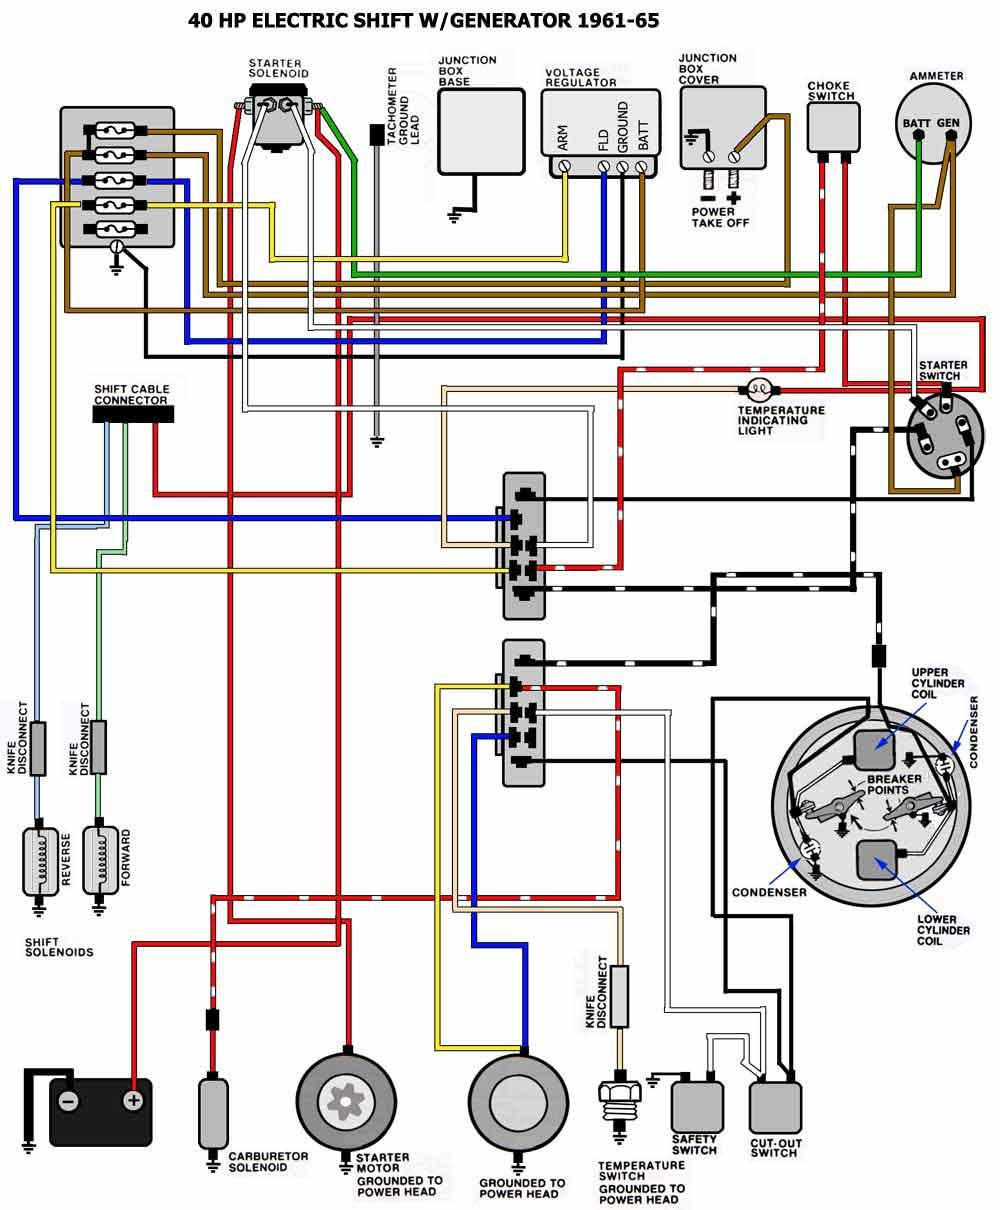 medium resolution of fiberglassics 59 johnson 50hp alternator fiberglassics forums motorcraft alternator wiring diagram evenrude wiring diagram alternator